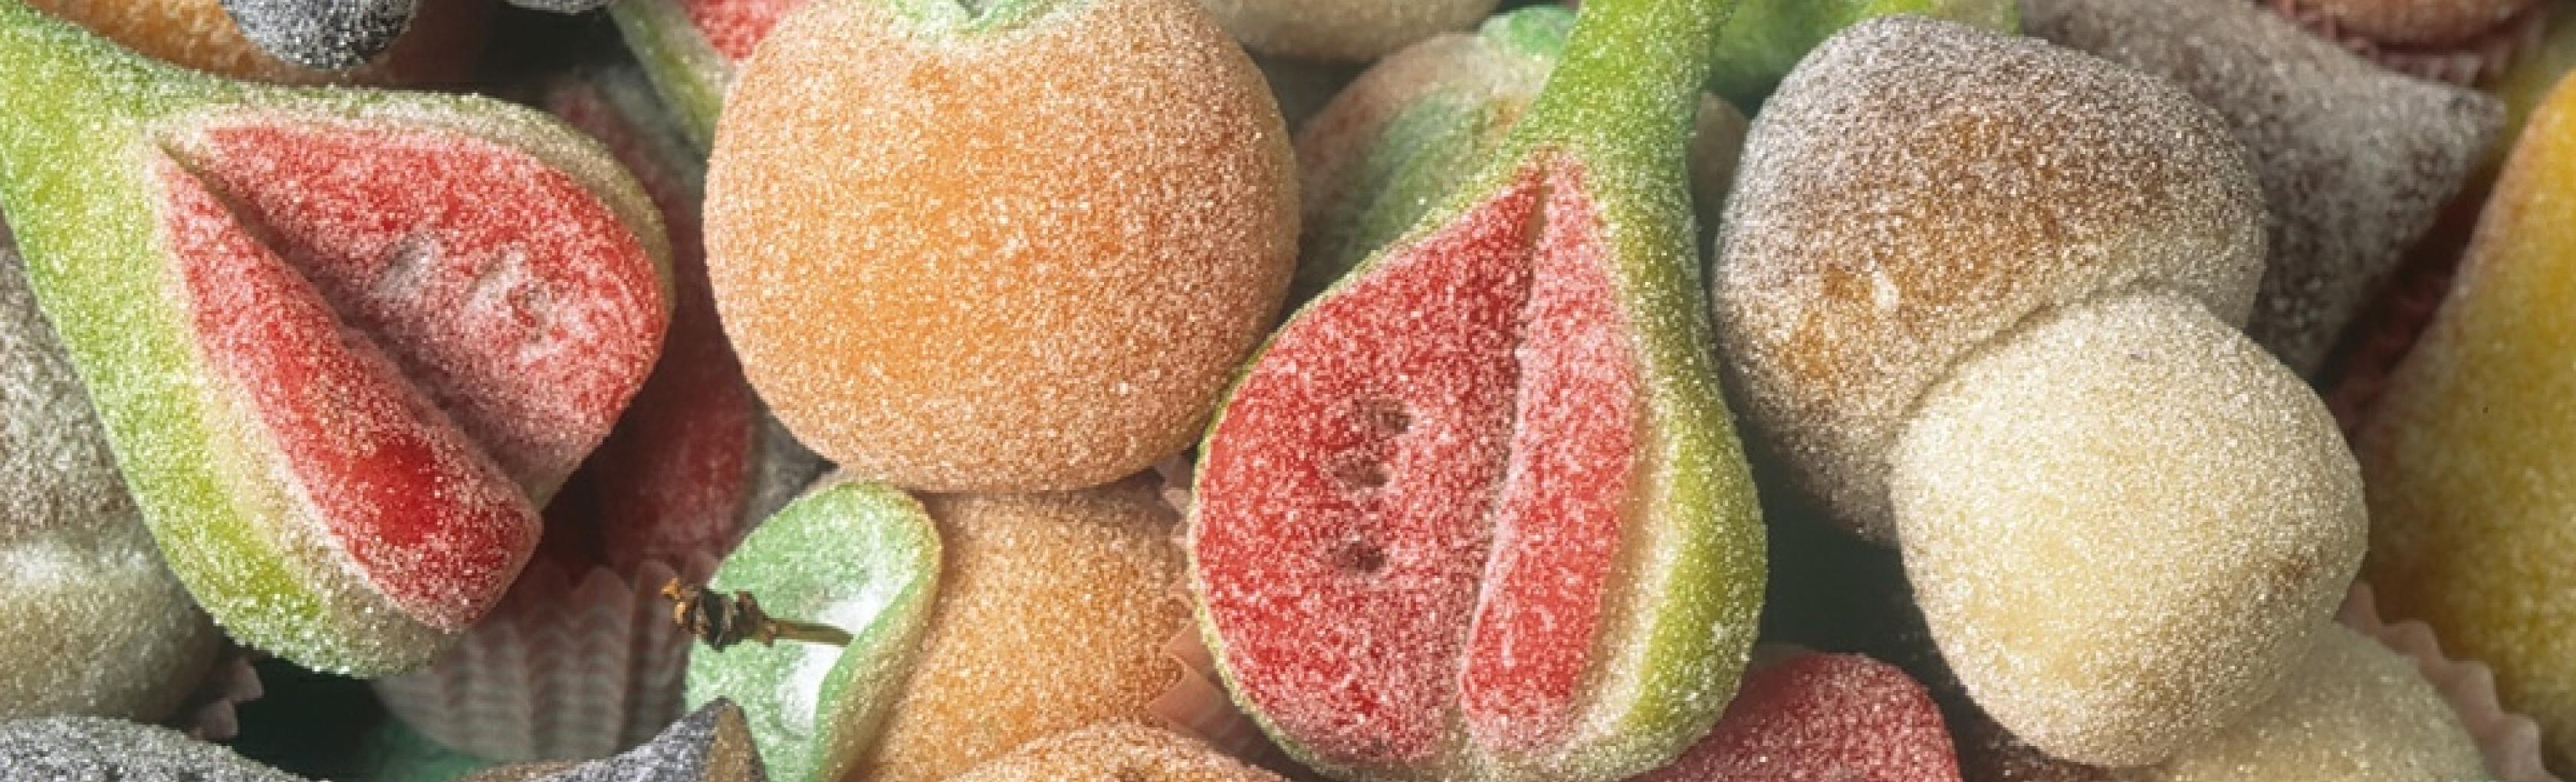 Sas fruttinas, dolce tipico - Ovodda